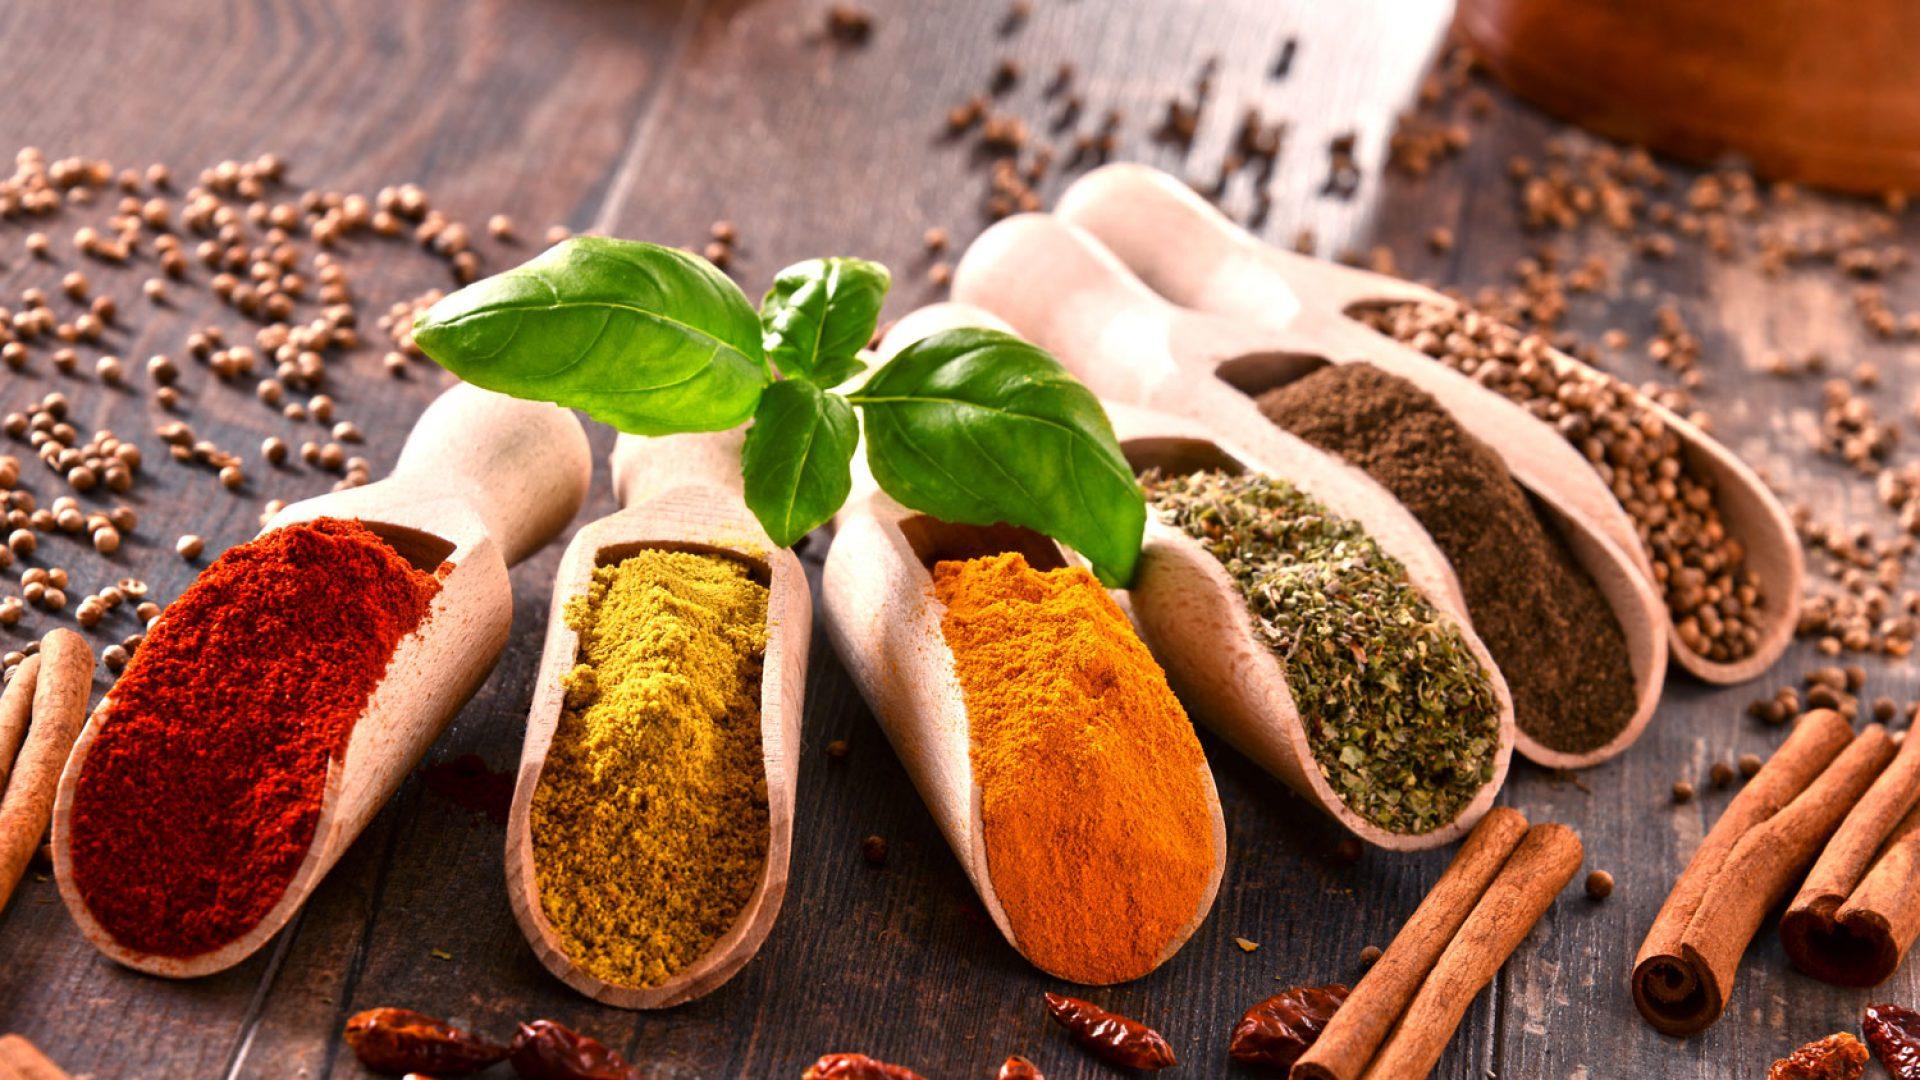 Spice Factory l Bulk Herbs l Bulk Spices l Spice Company l Dried Herbs